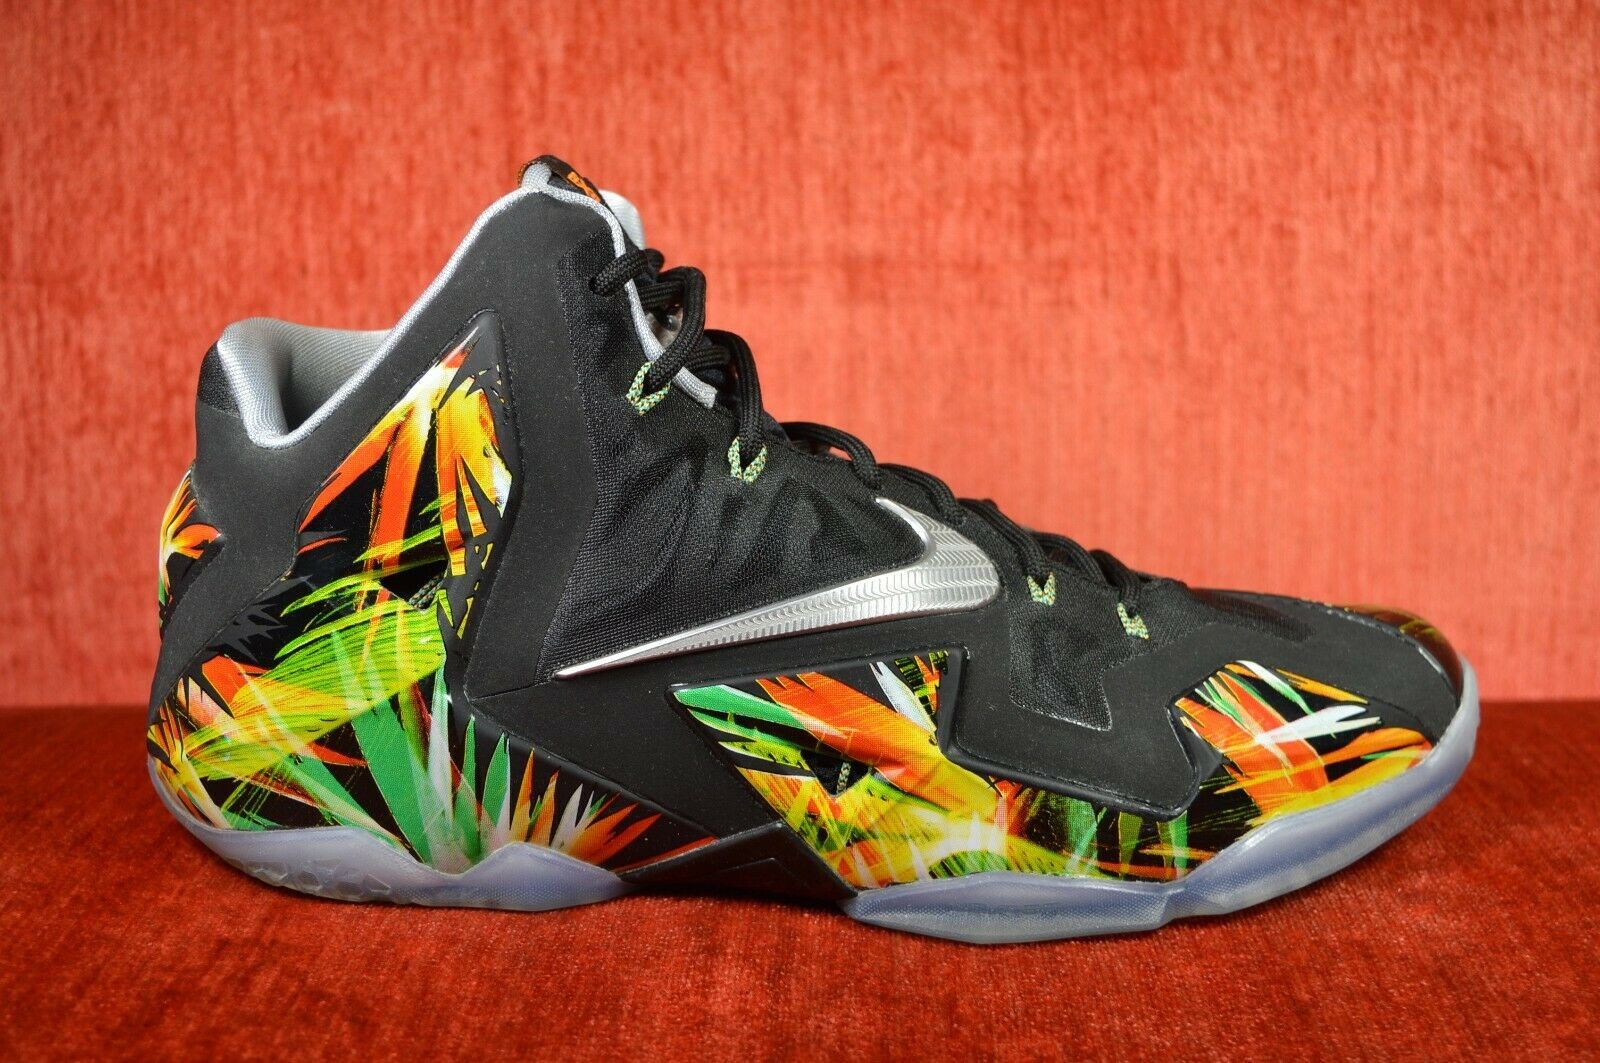 WORN TWICE Nike Lebron XI 11 Everglades Black Silver Green 616175-006 Size 11